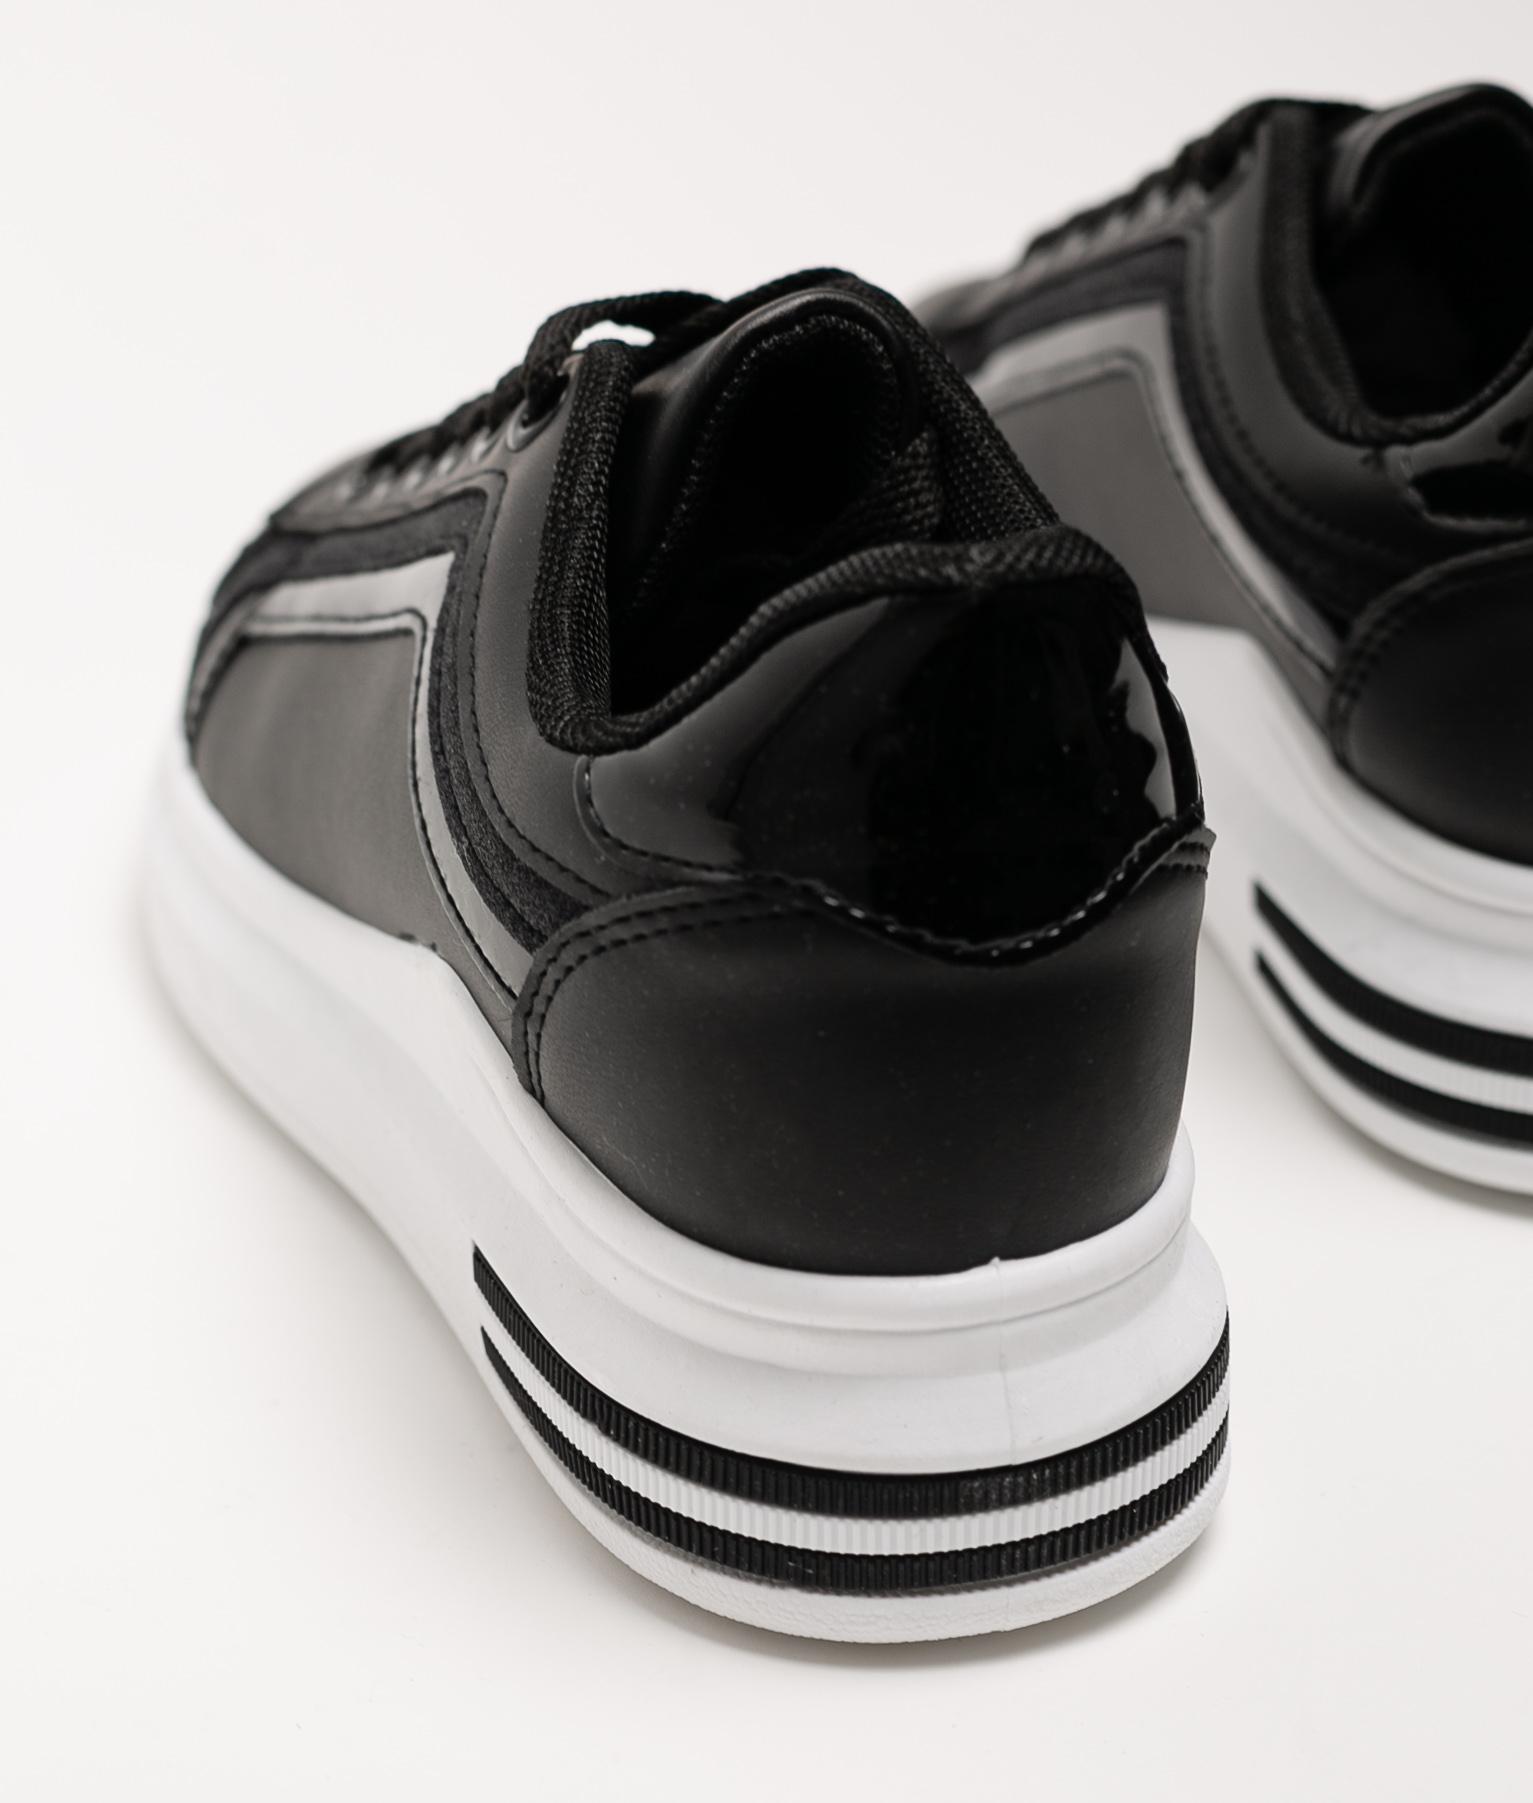 Sneakers LUPI - Black